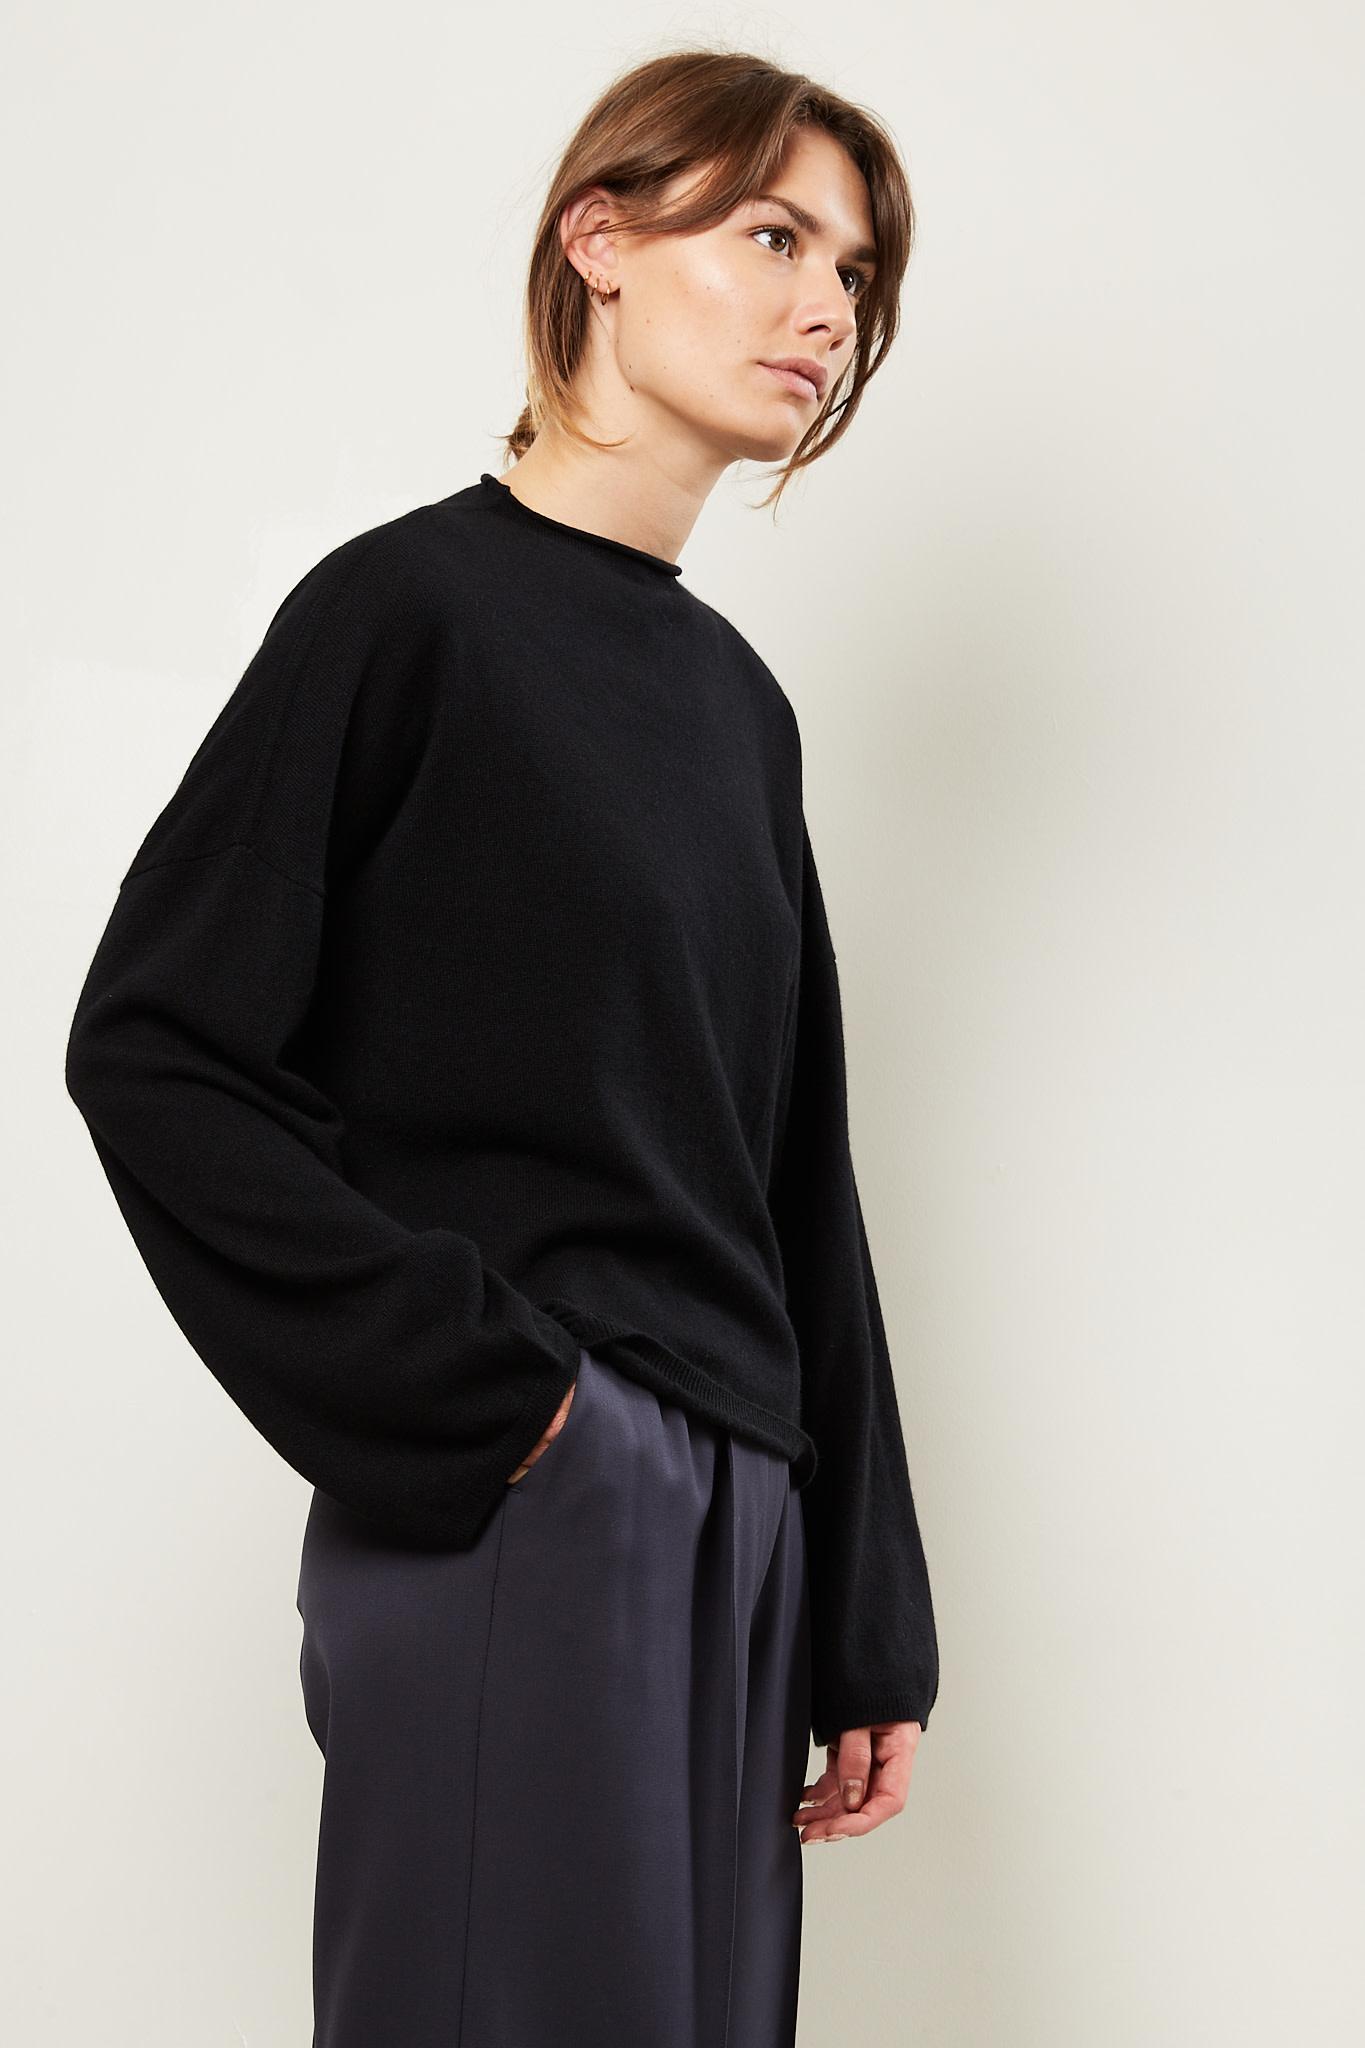 loulou studio Vacca cashmere sweater